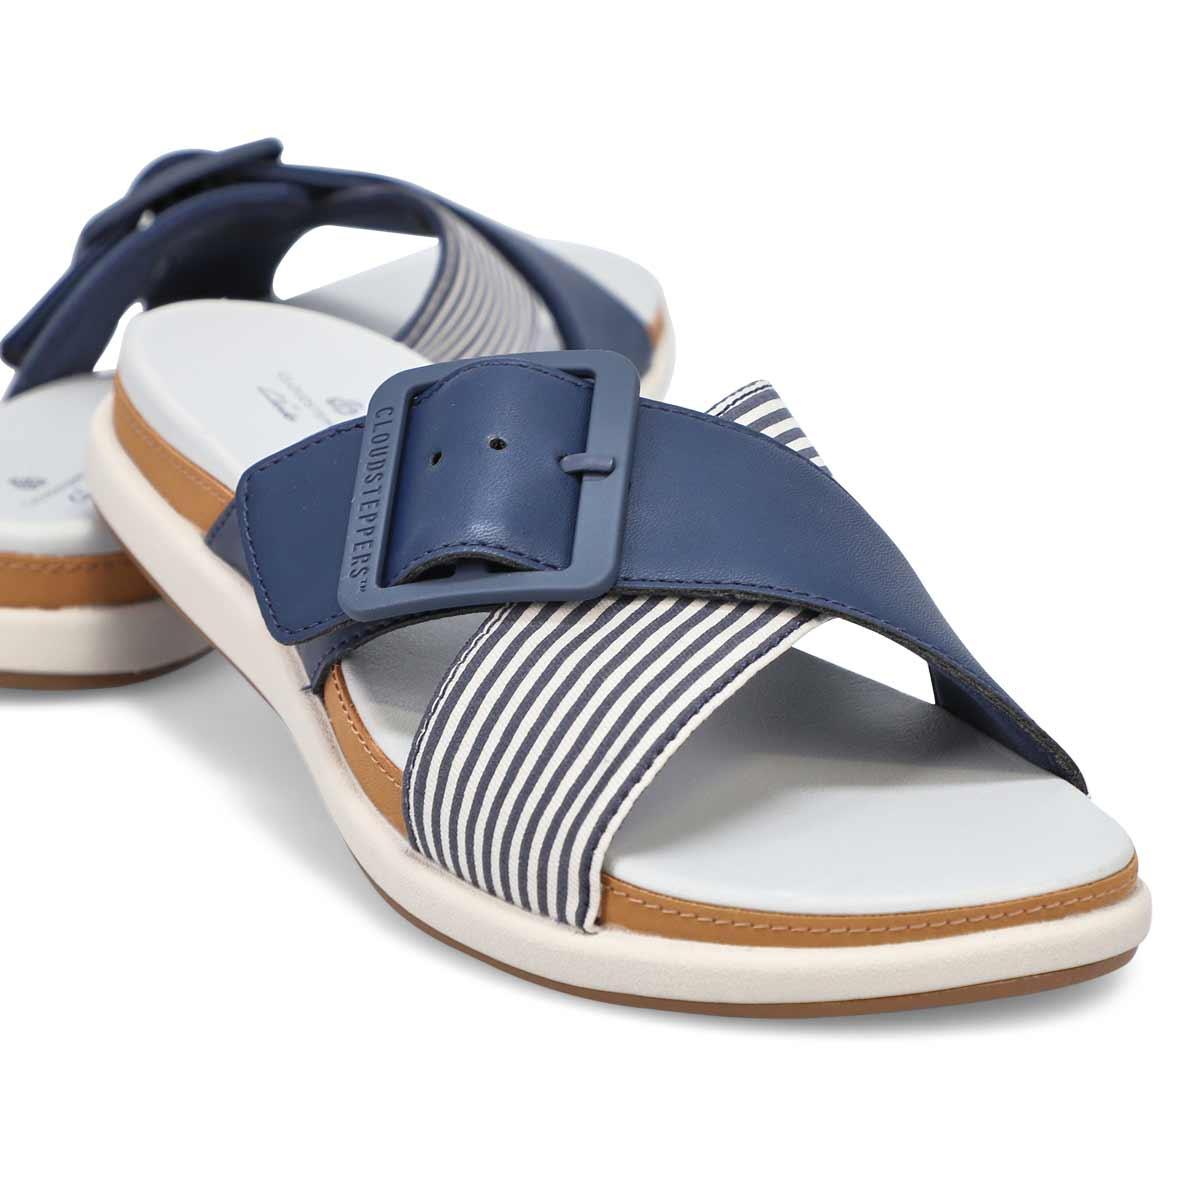 Women's Eliza April Casual Slide Sandal - Navy